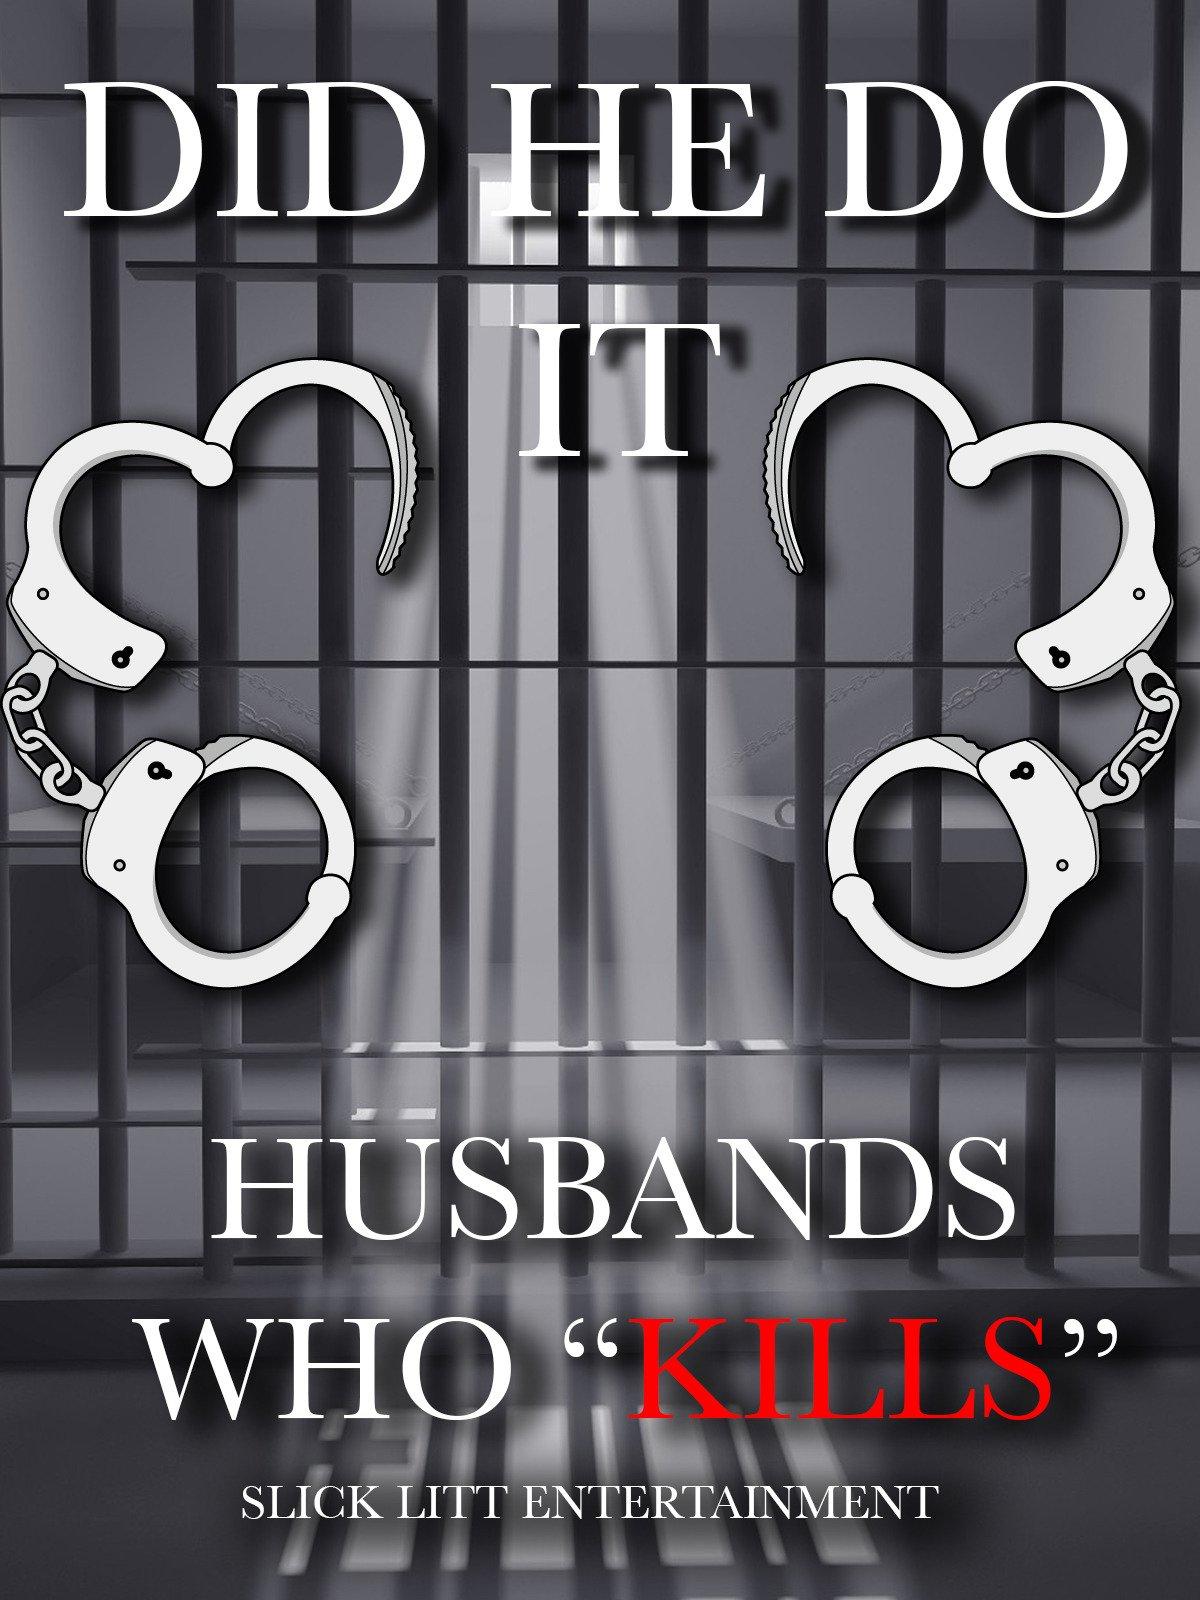 Did he do it, Husbands who kills